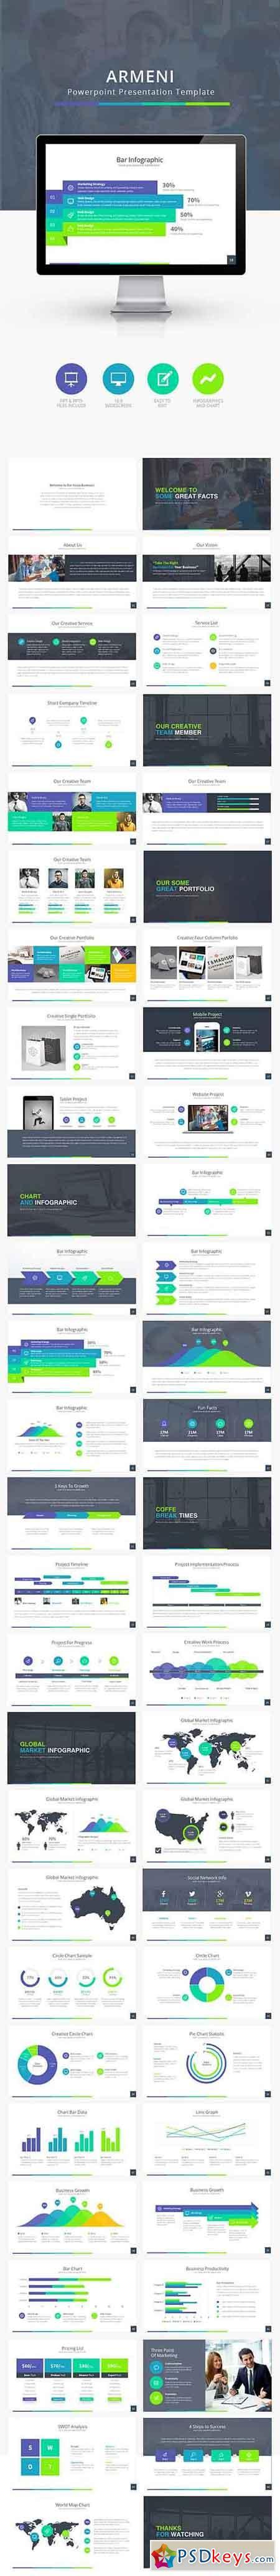 Armeni Powerpoint Presentation 8799525